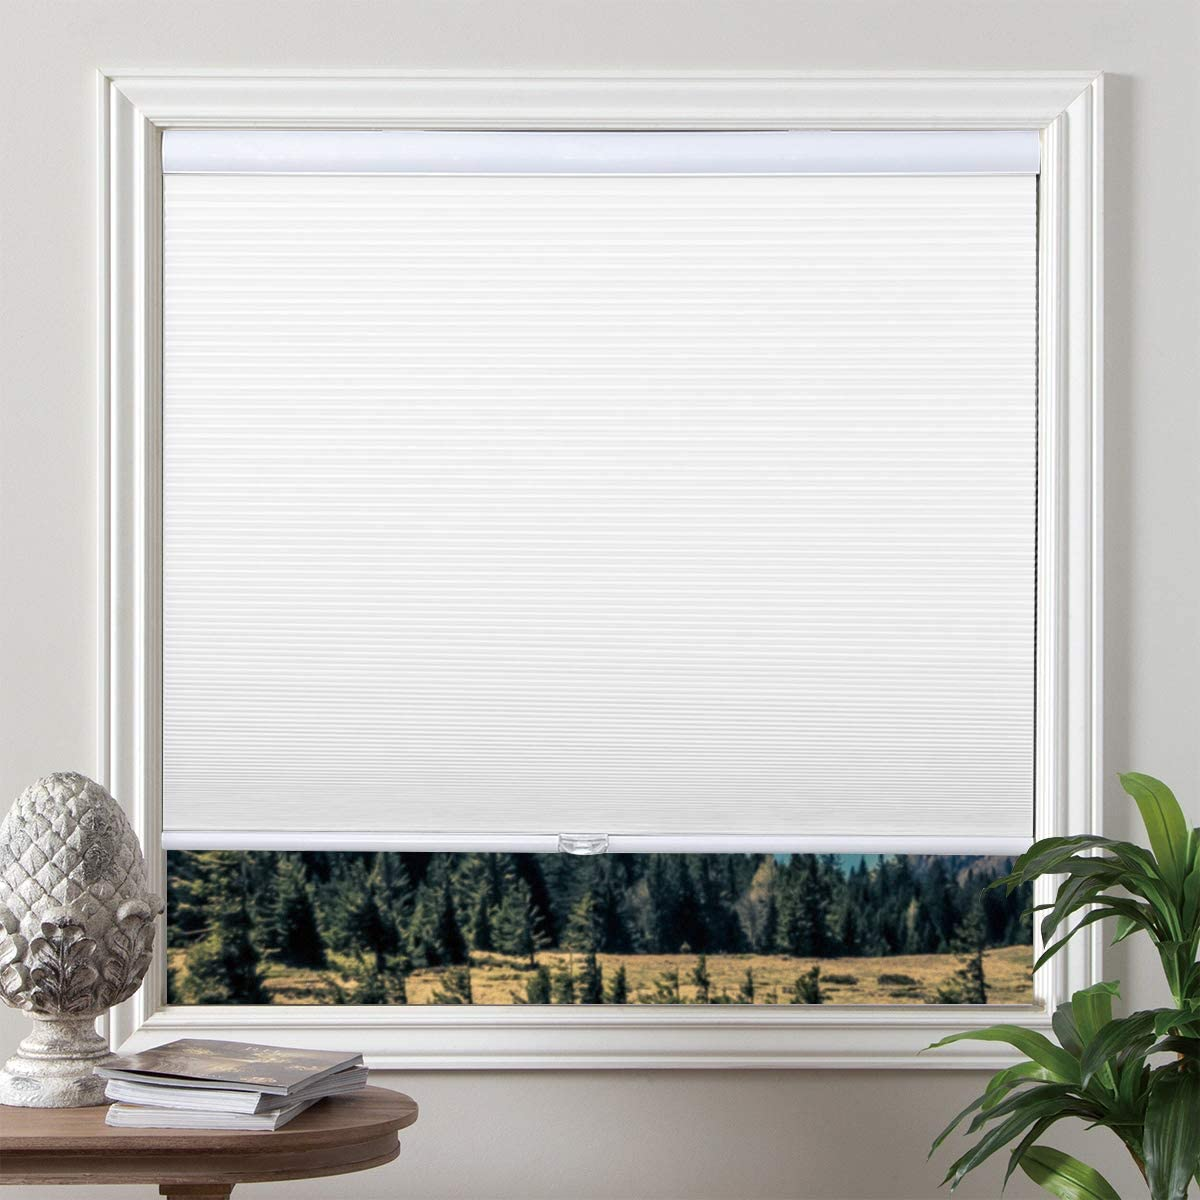 Grandekor Blackout Shades Cordless Blinds Cellular Fabric Blinds Honeycomb Door Window Shades 35x64, White-White